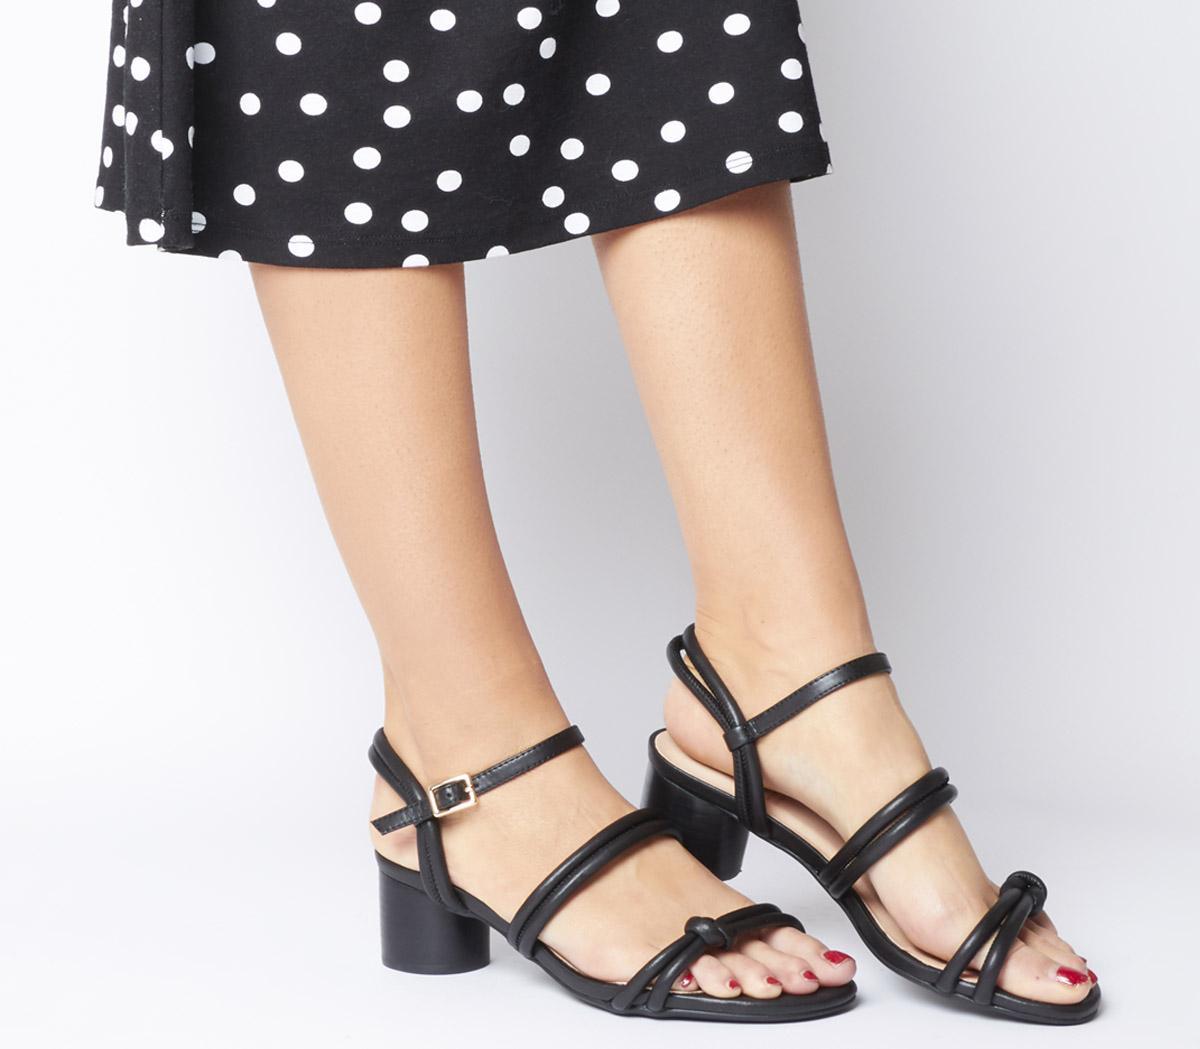 Shoe the Bear Aya Knot Sandals Black